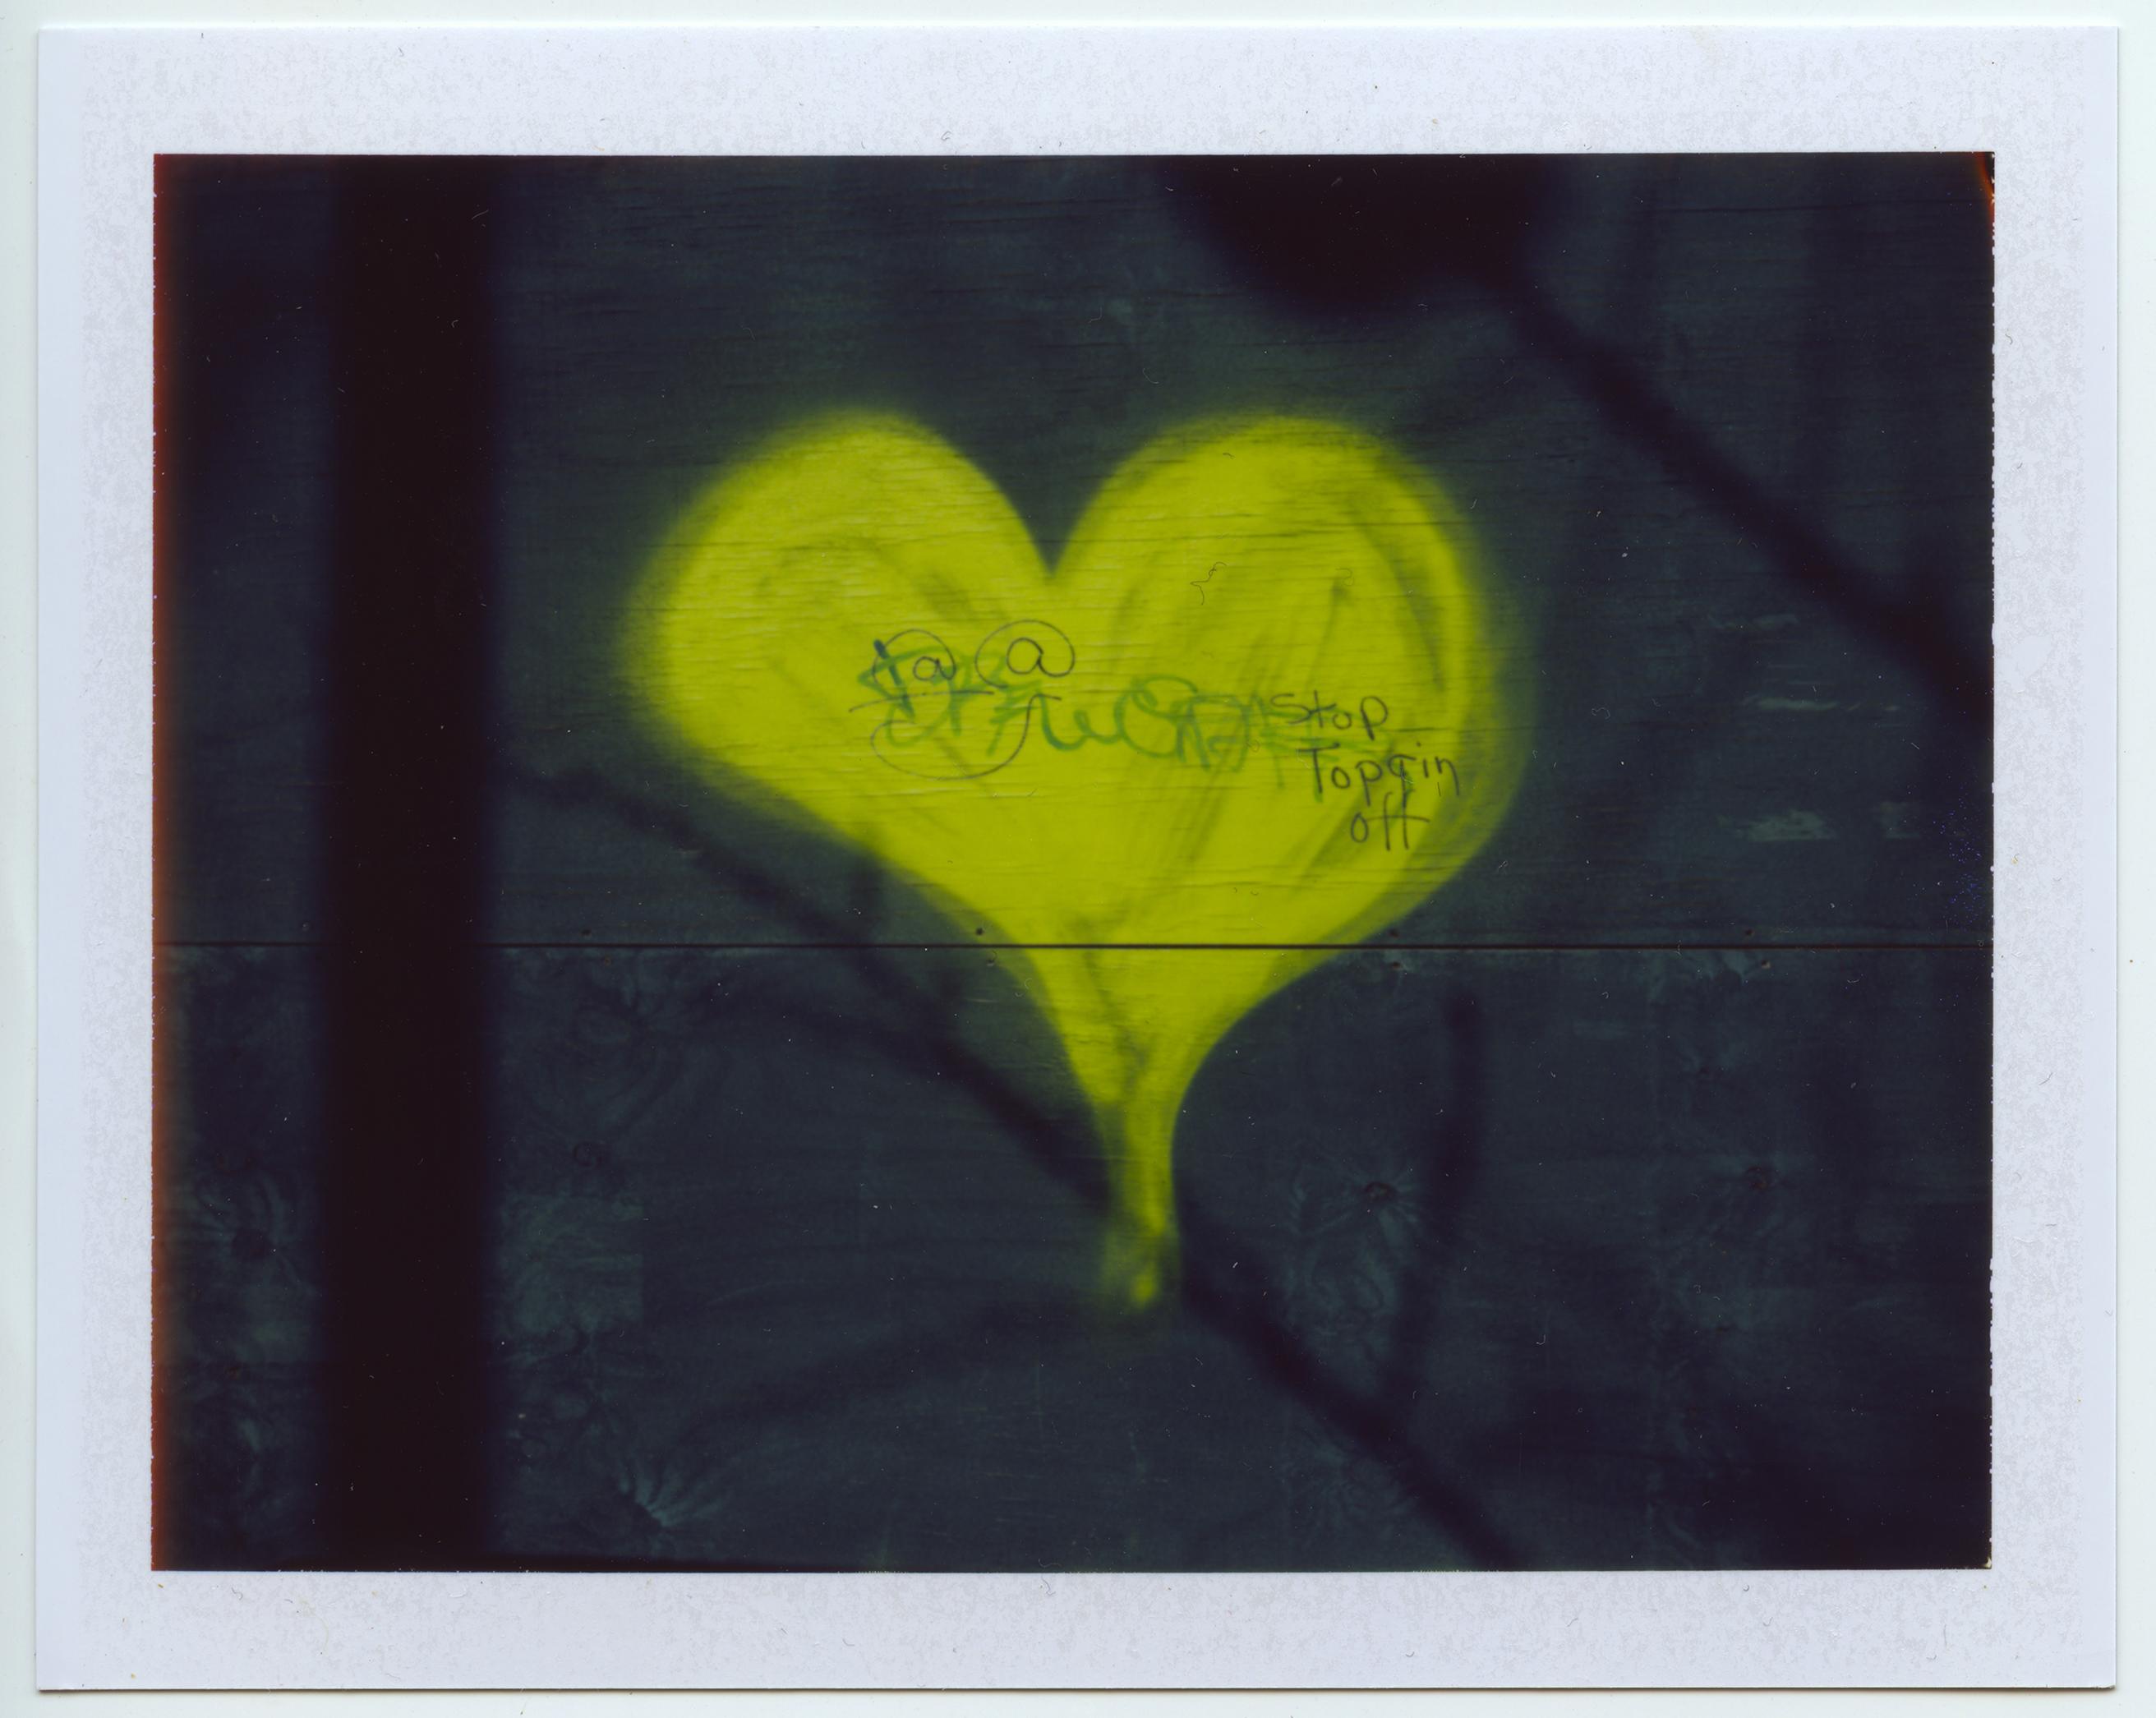 Graffiti Heart - Harlem, NYC